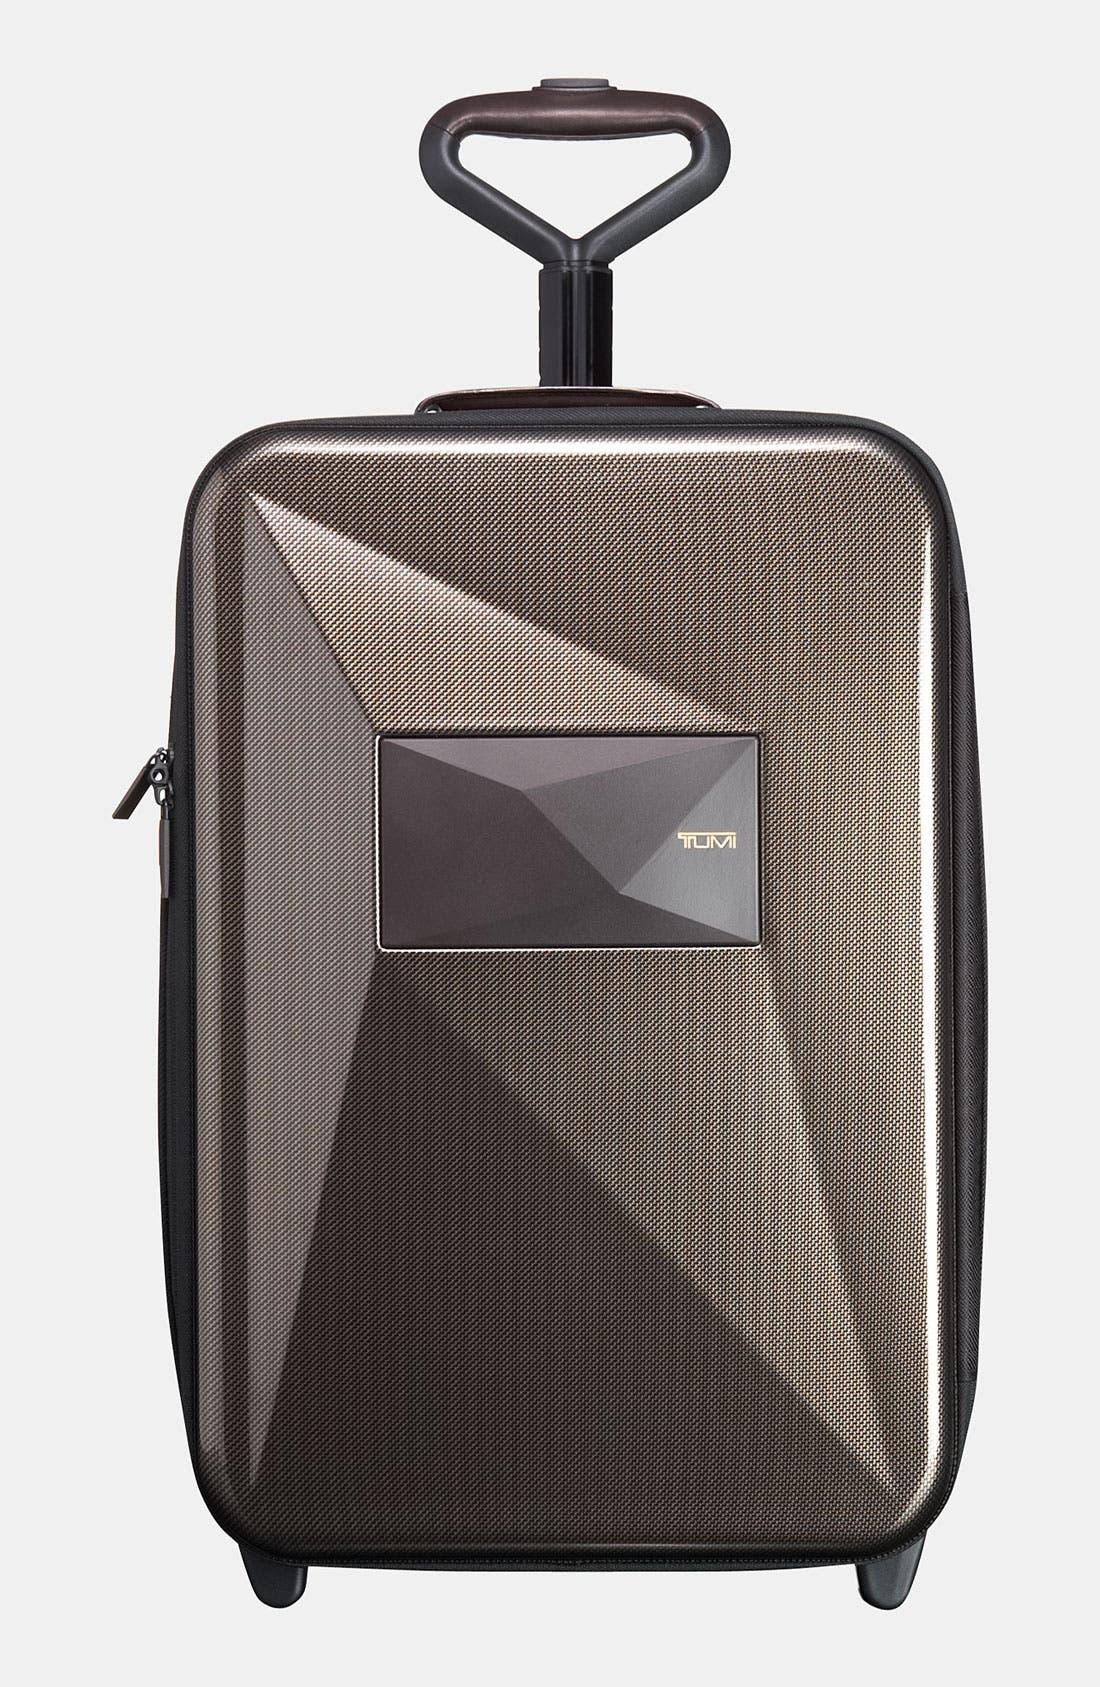 Main Image - Tumi 'Dror' International Expandable Carry-On